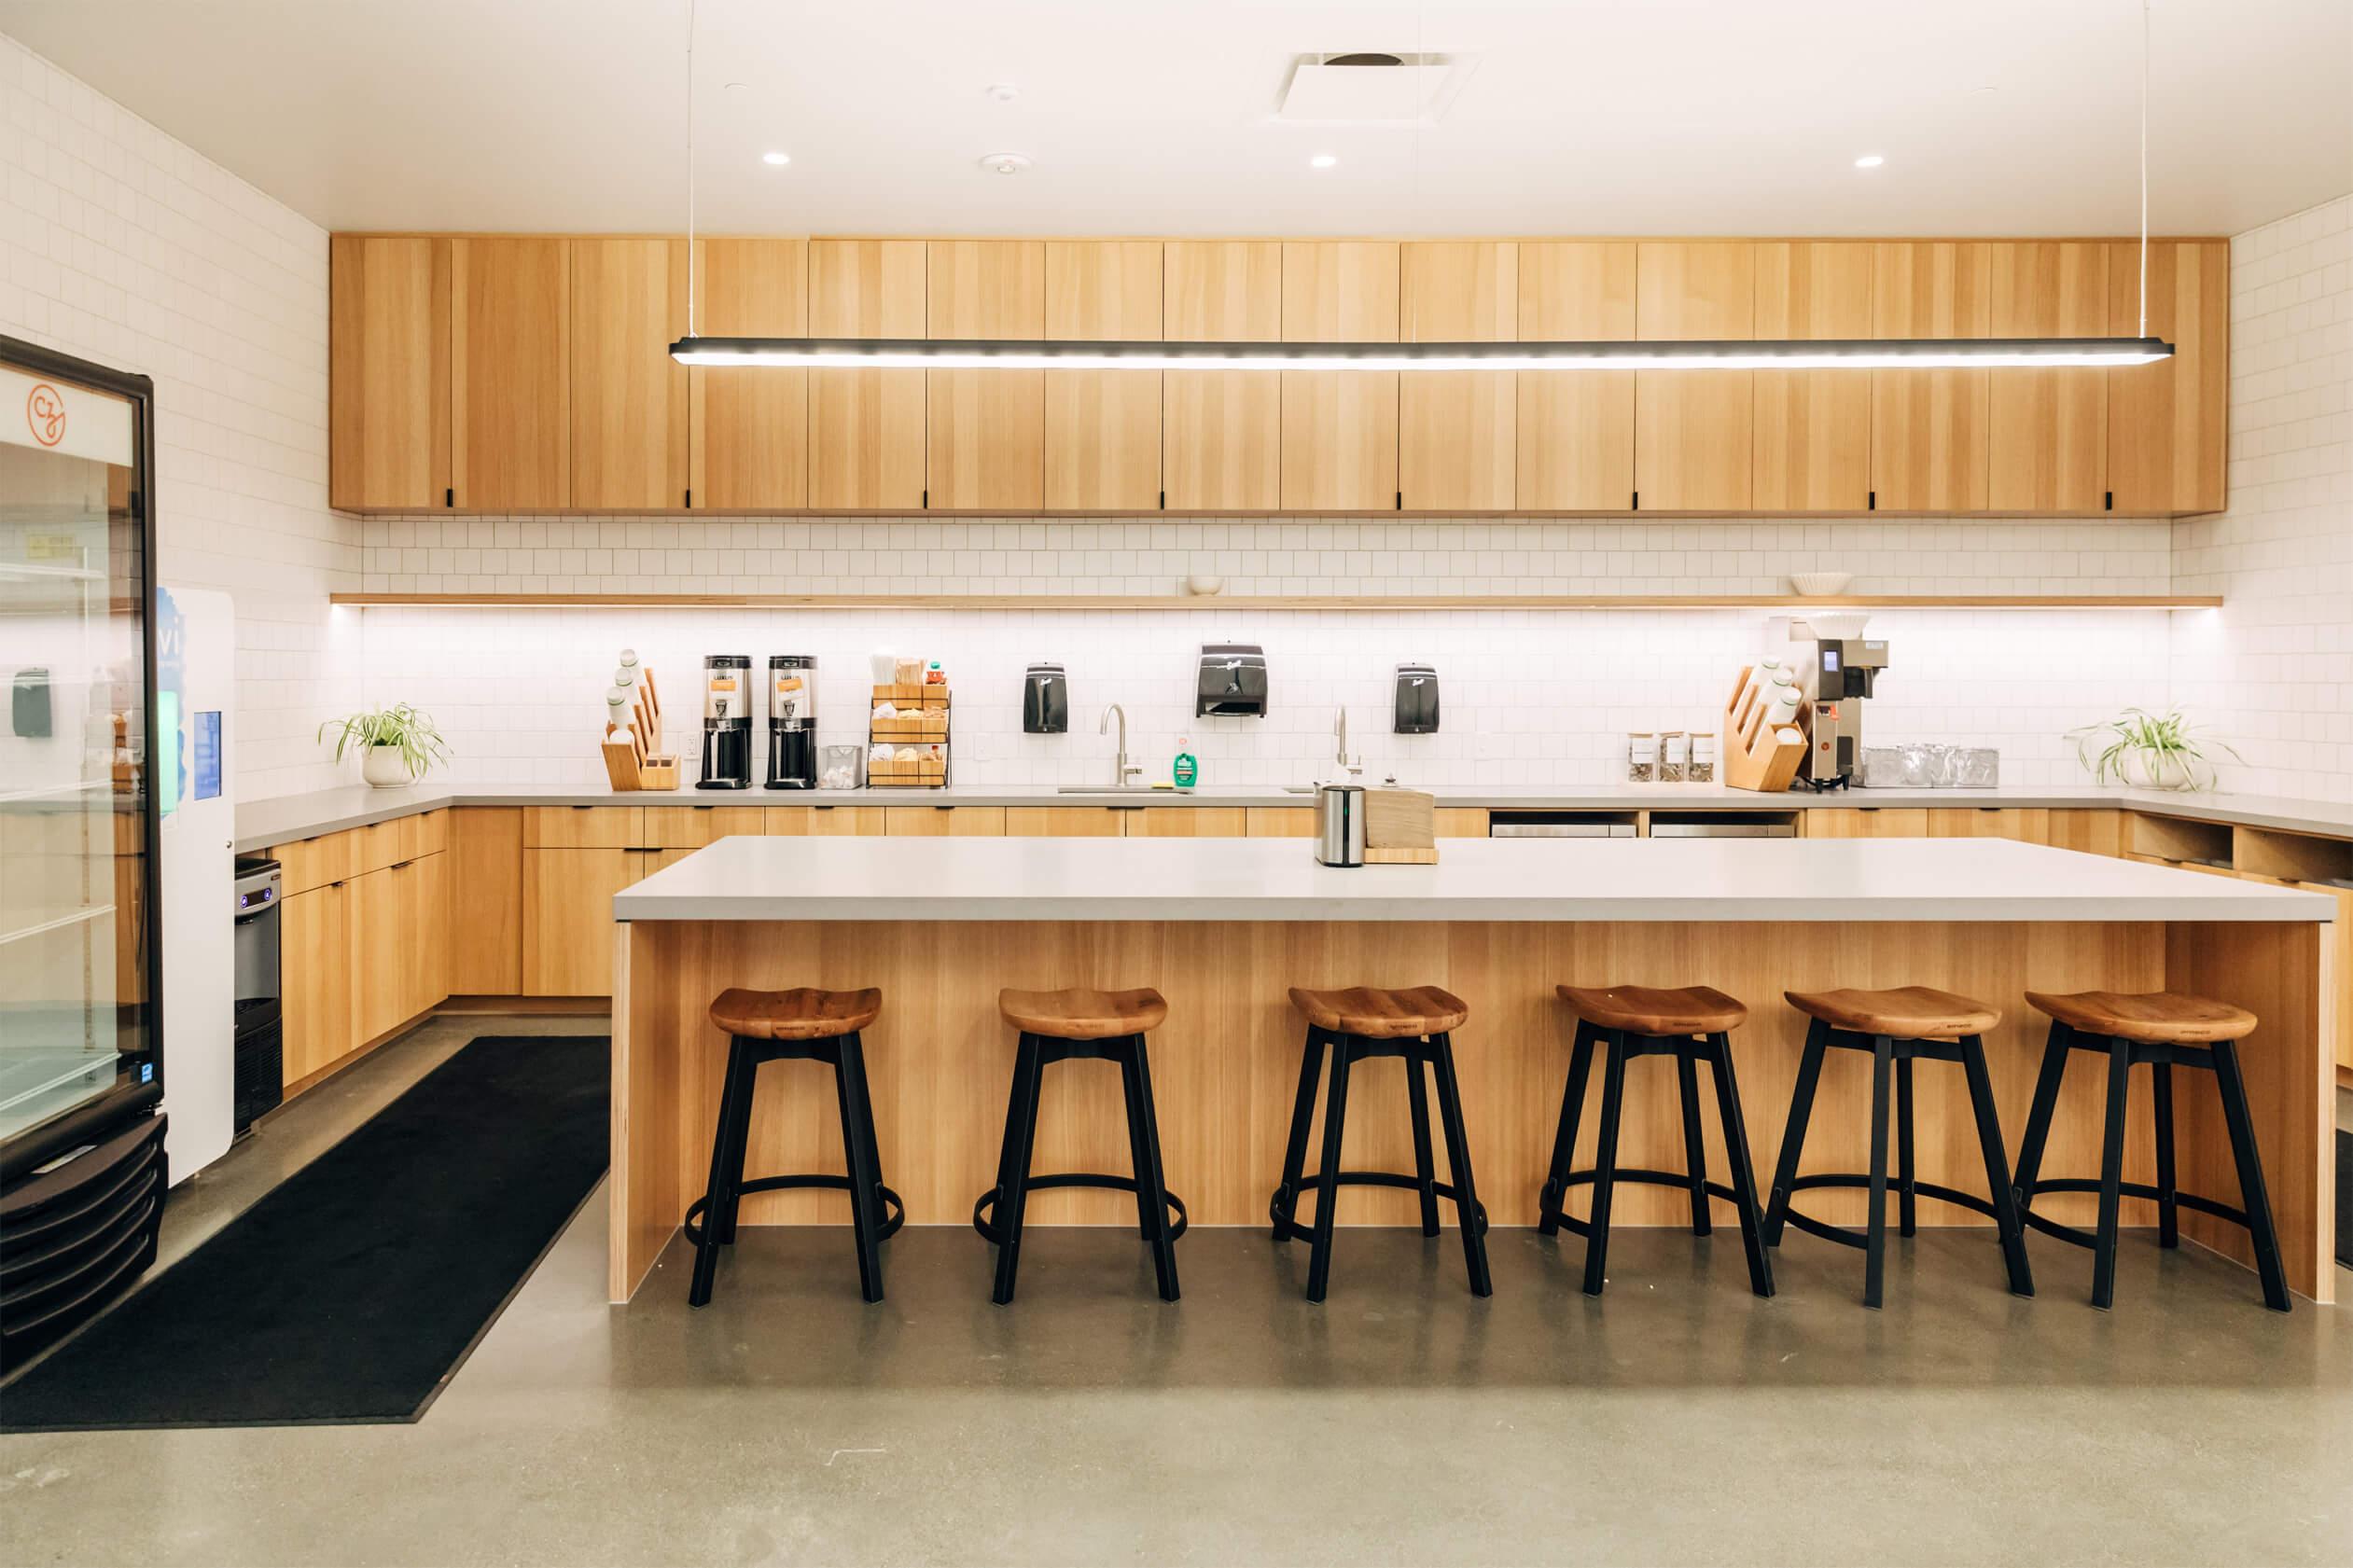 Community Space Kitchen